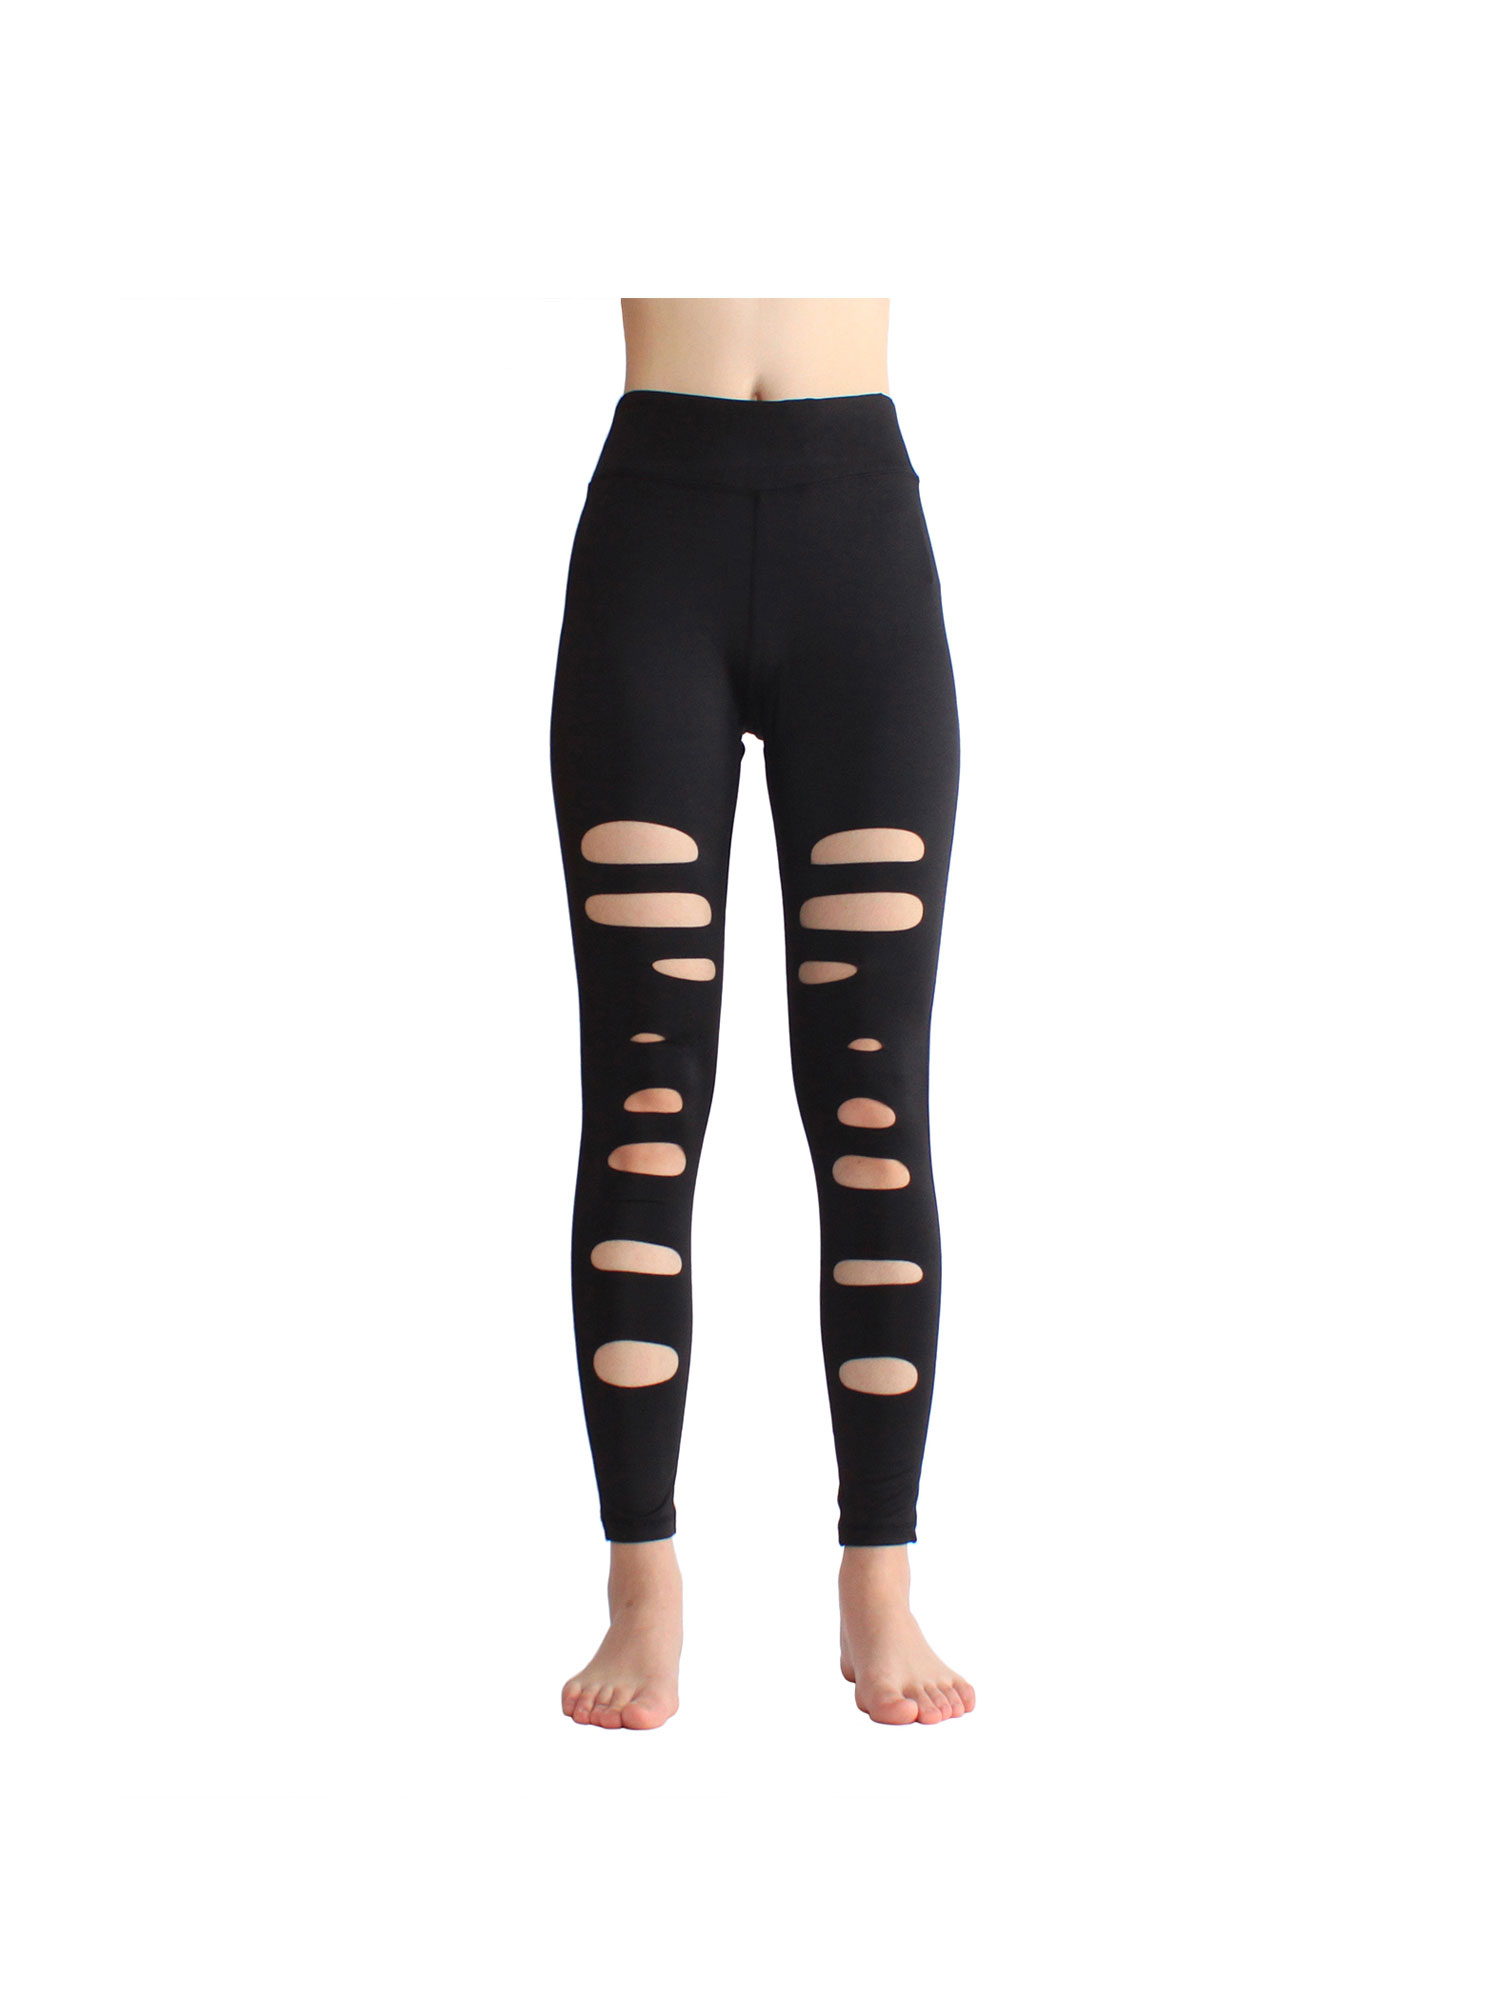 Womens Cutout Yoga Pants Elastic Gym Nine Pants Sports Running Fitness Tight Long Pants